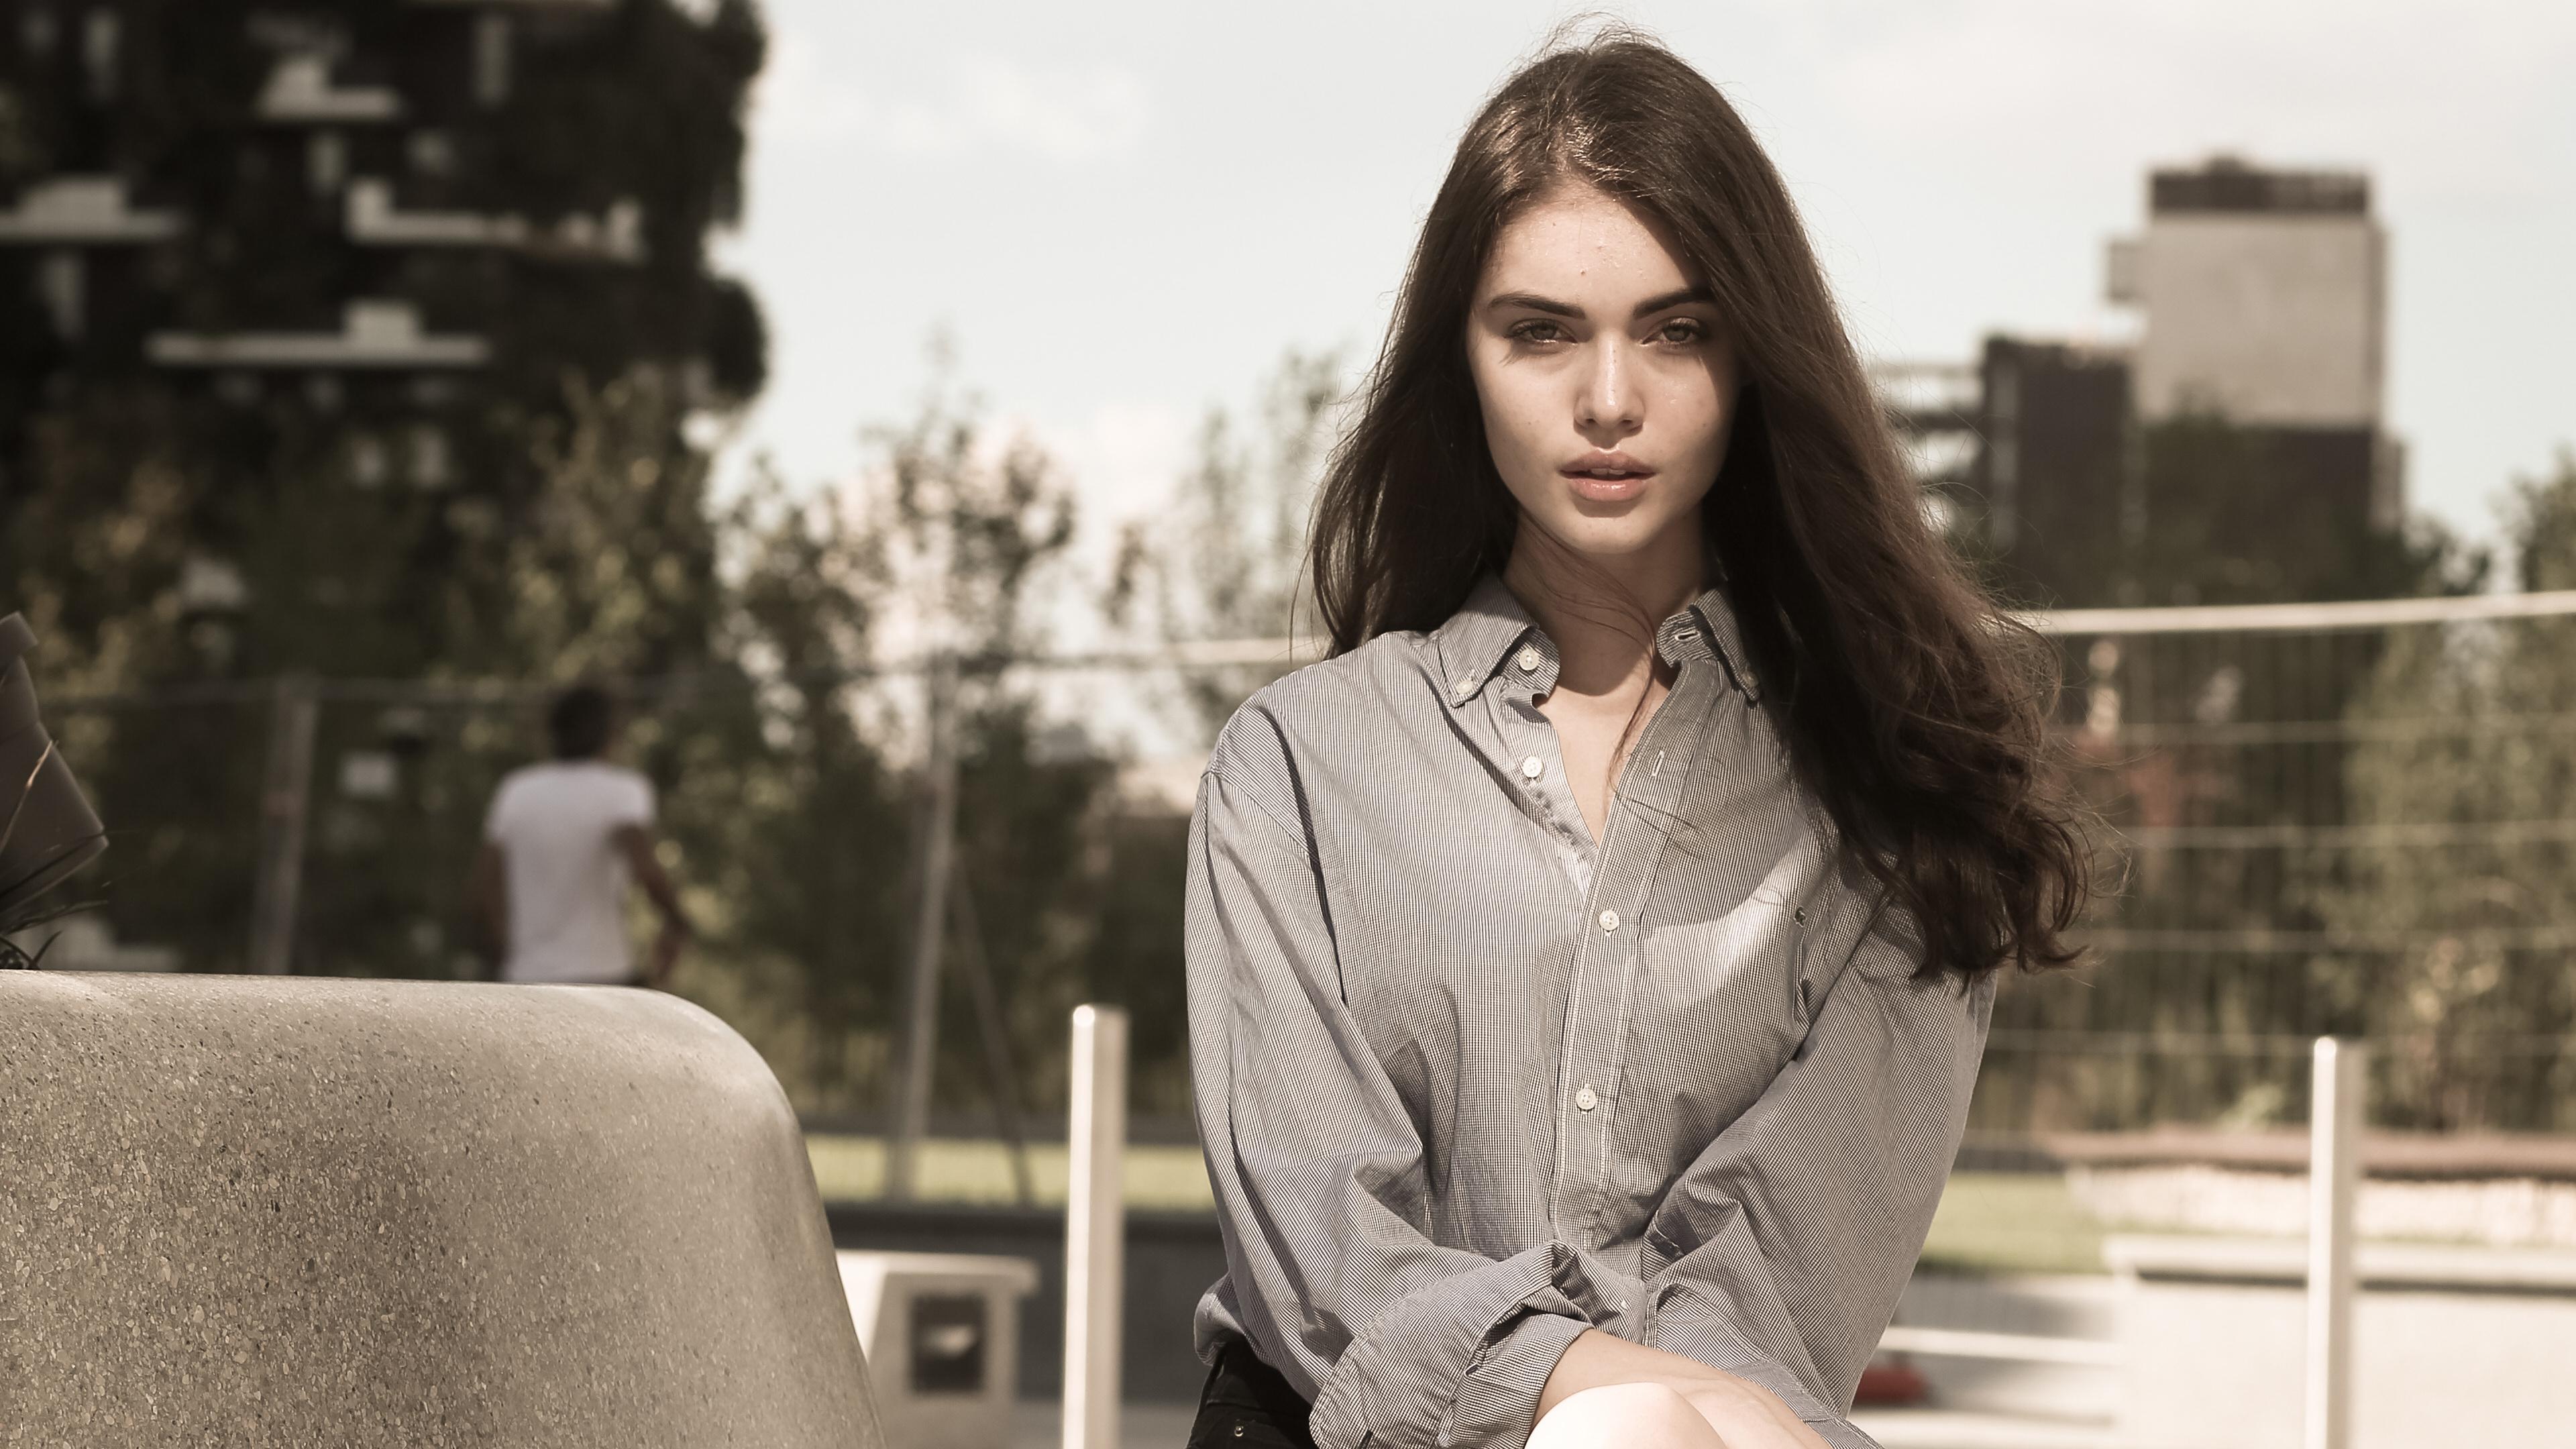 girl sitting outside portrait 1575664954 - Girl Sitting Outside Portrait -